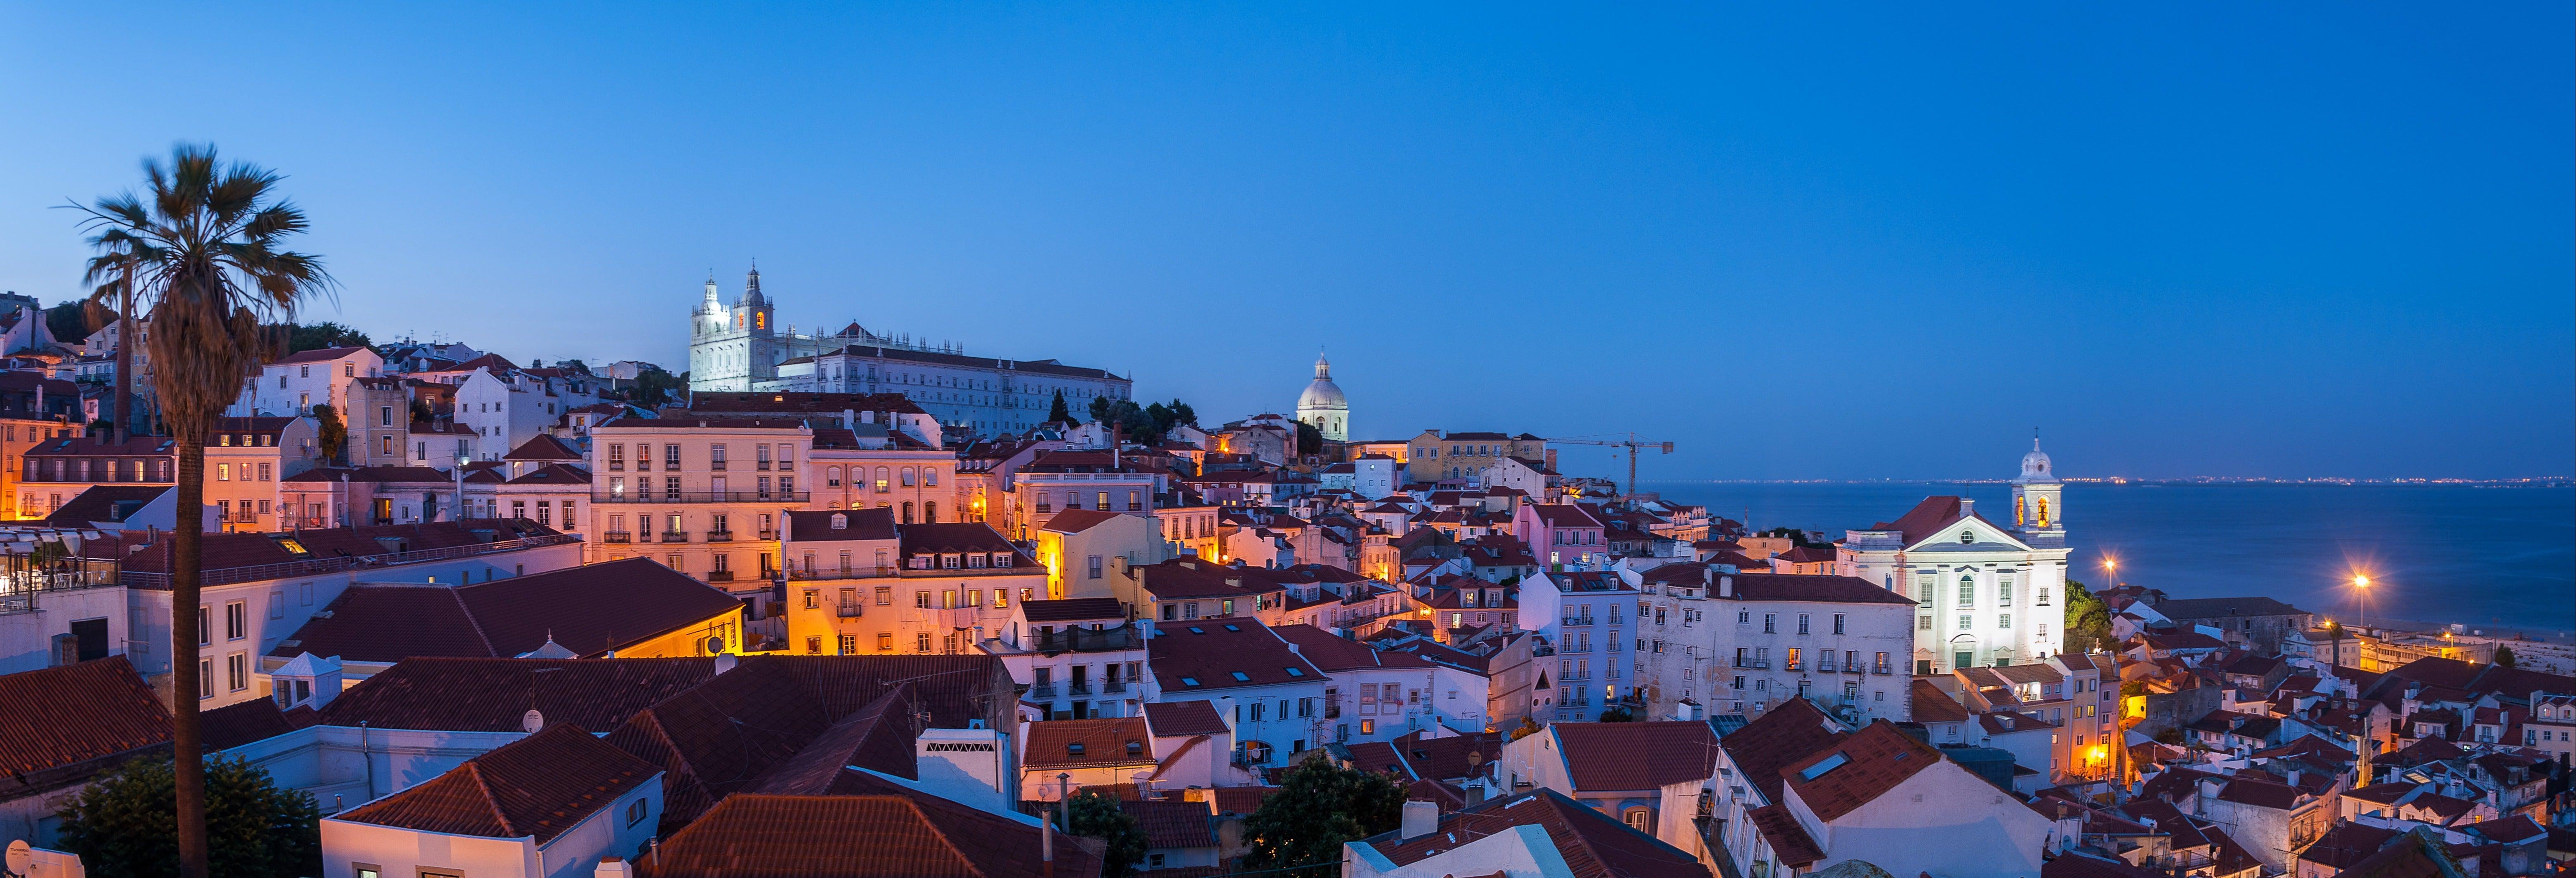 Free tour nocturno por Lisboa